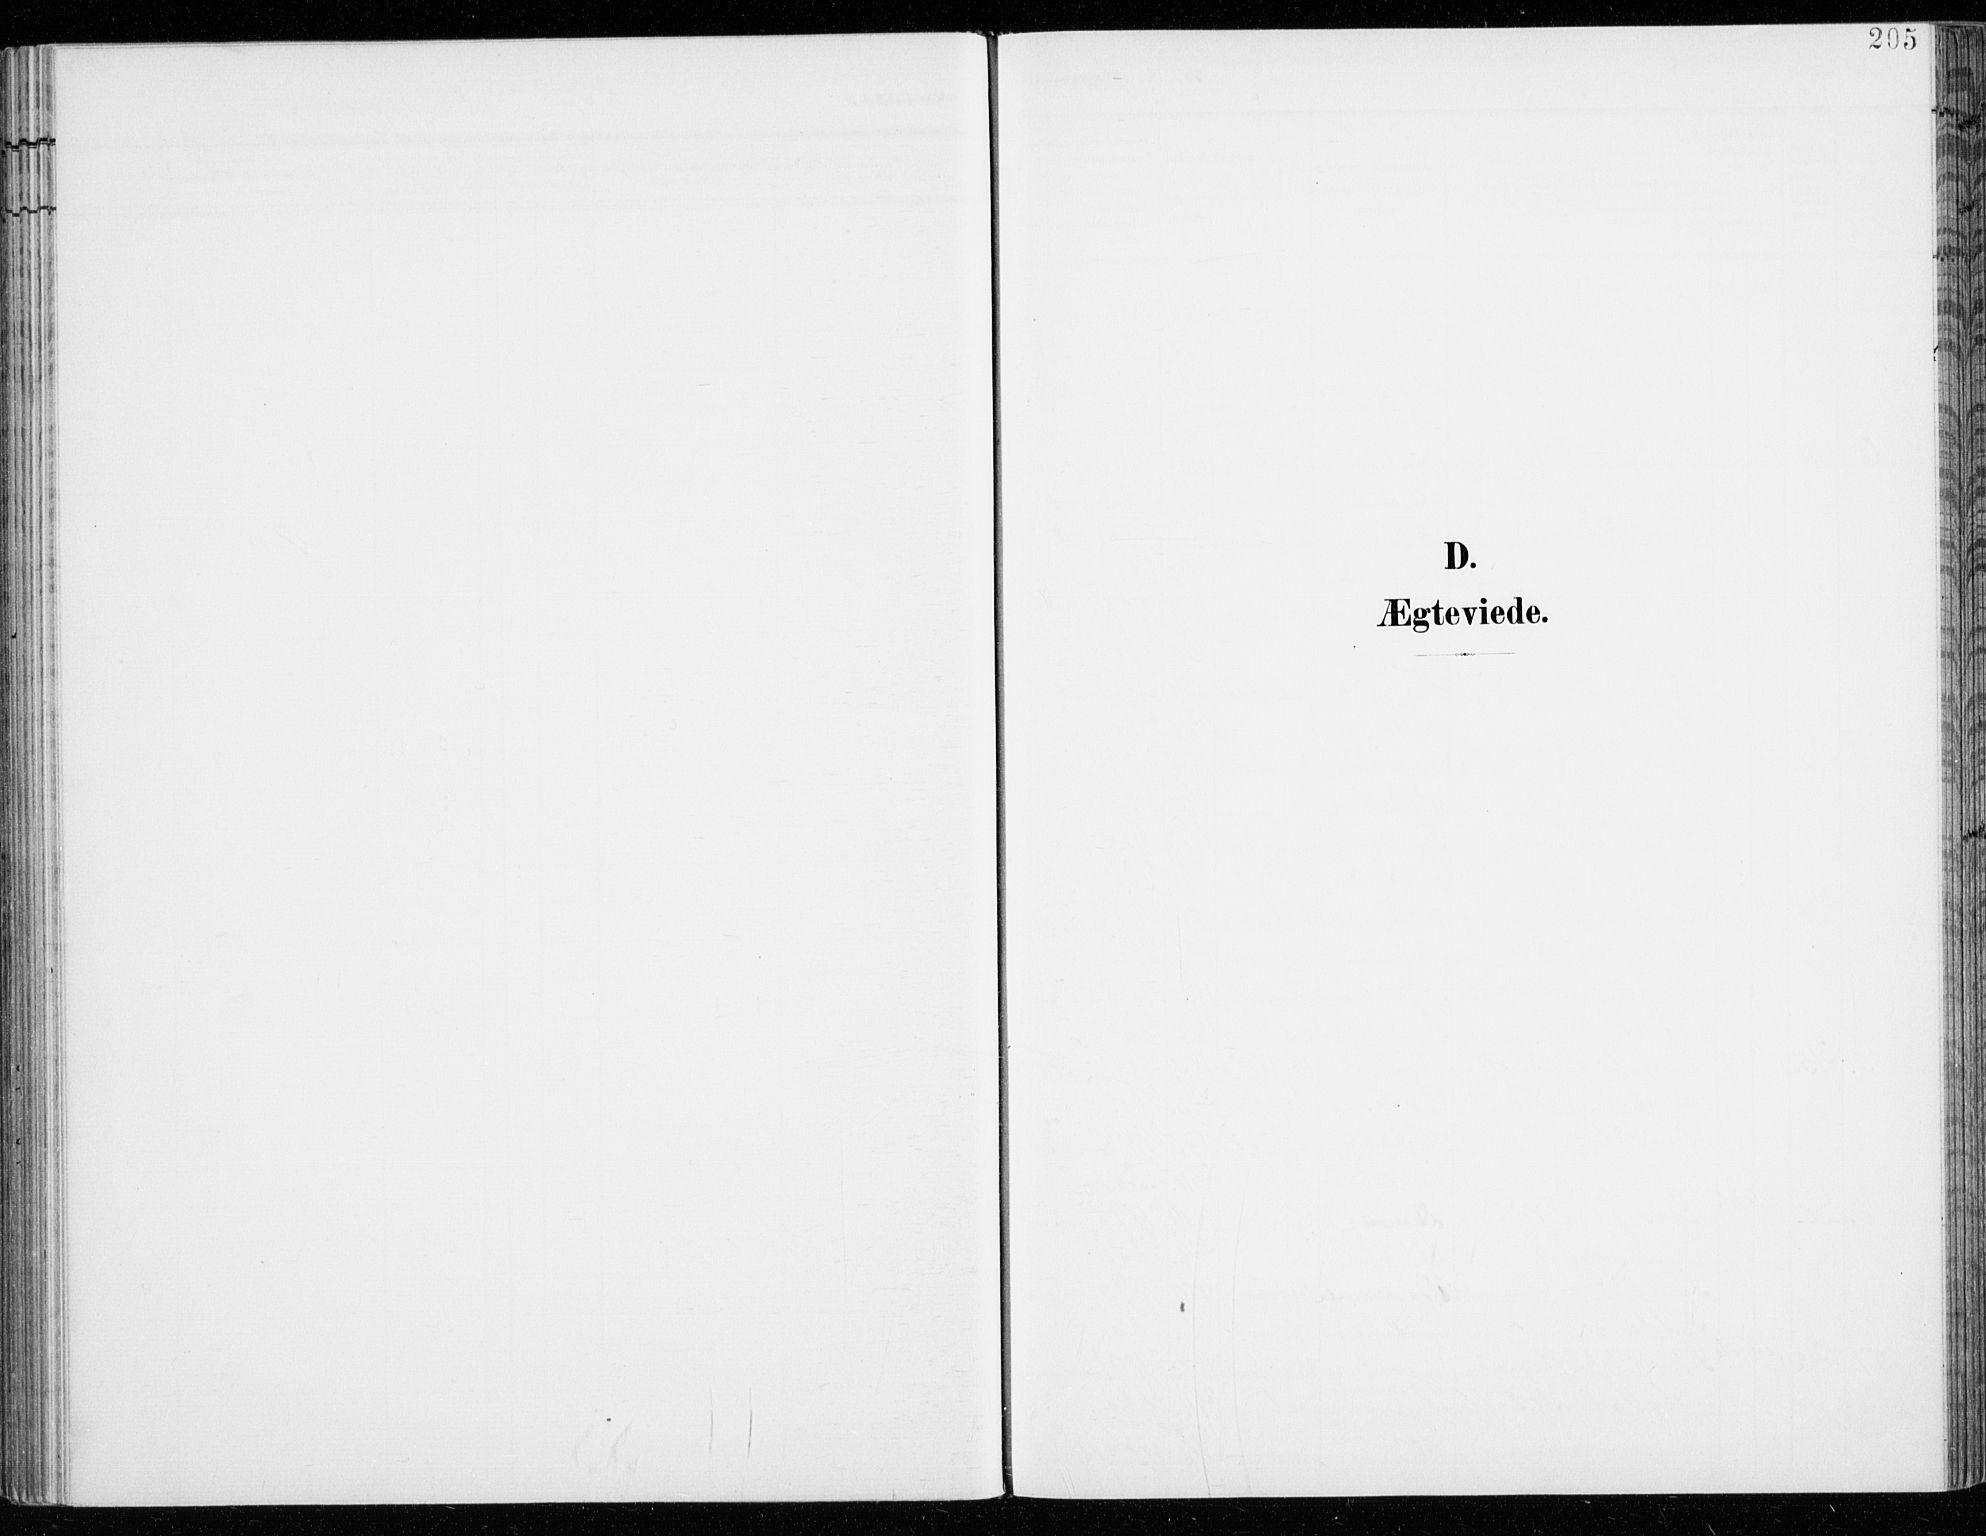 SAH, Fåberg prestekontor, Ministerialbok nr. 11, 1899-1913, s. 205